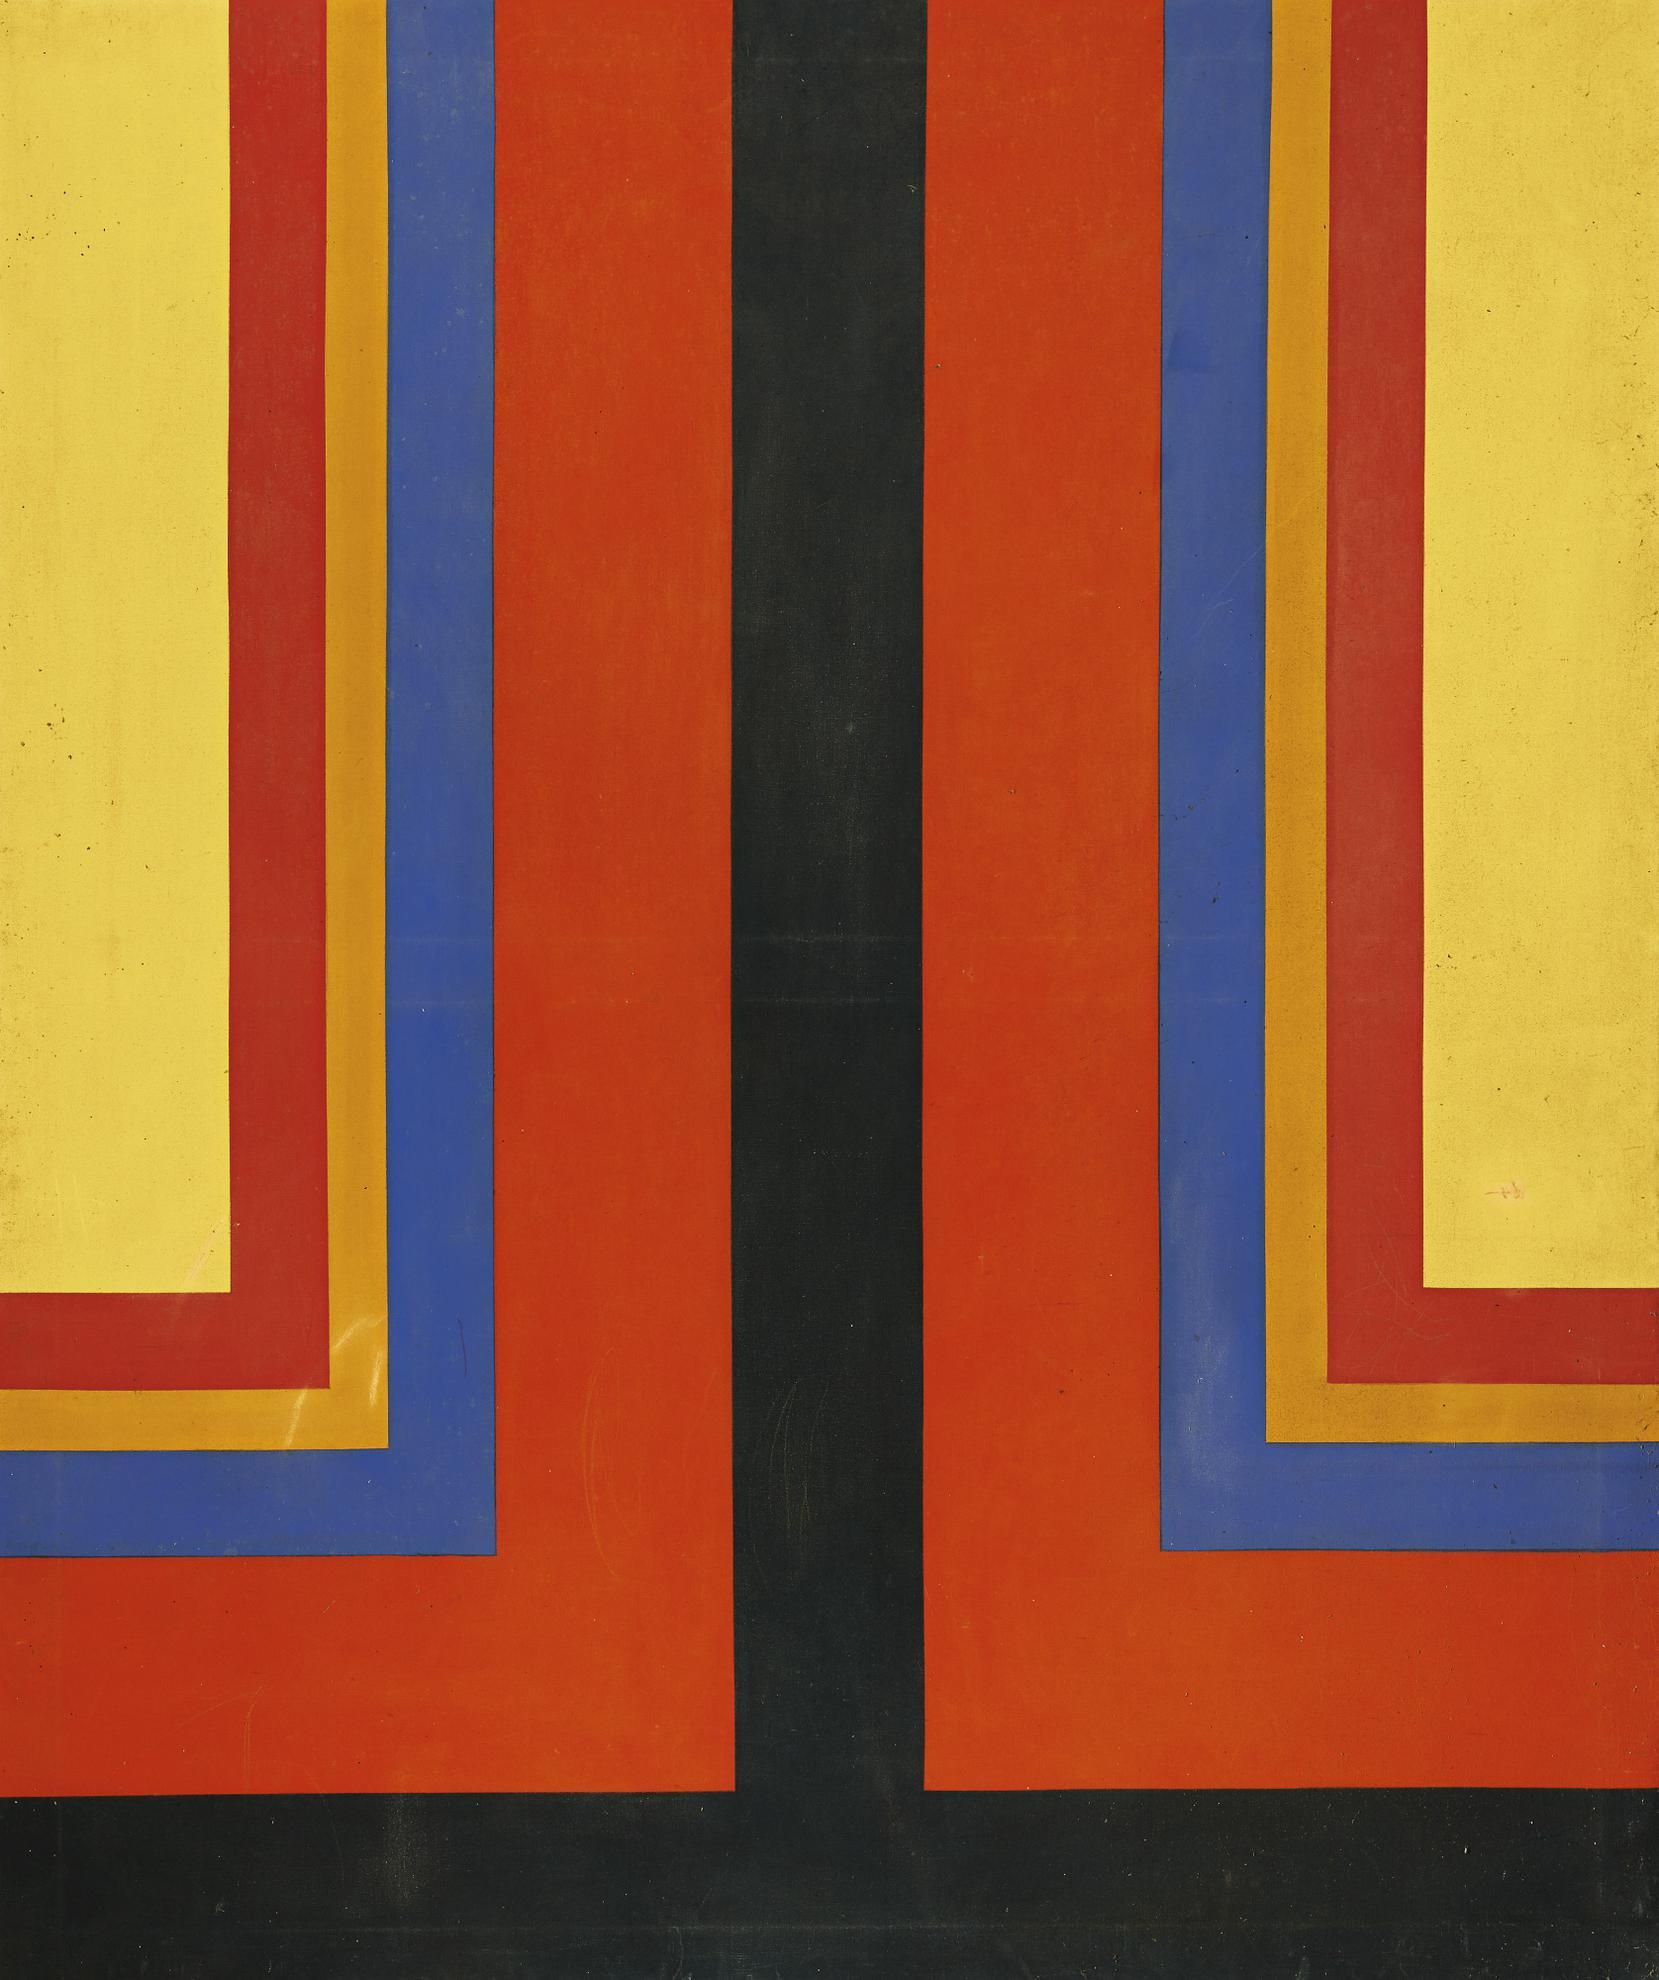 Howard Mehring-Brilliant Corners-1965